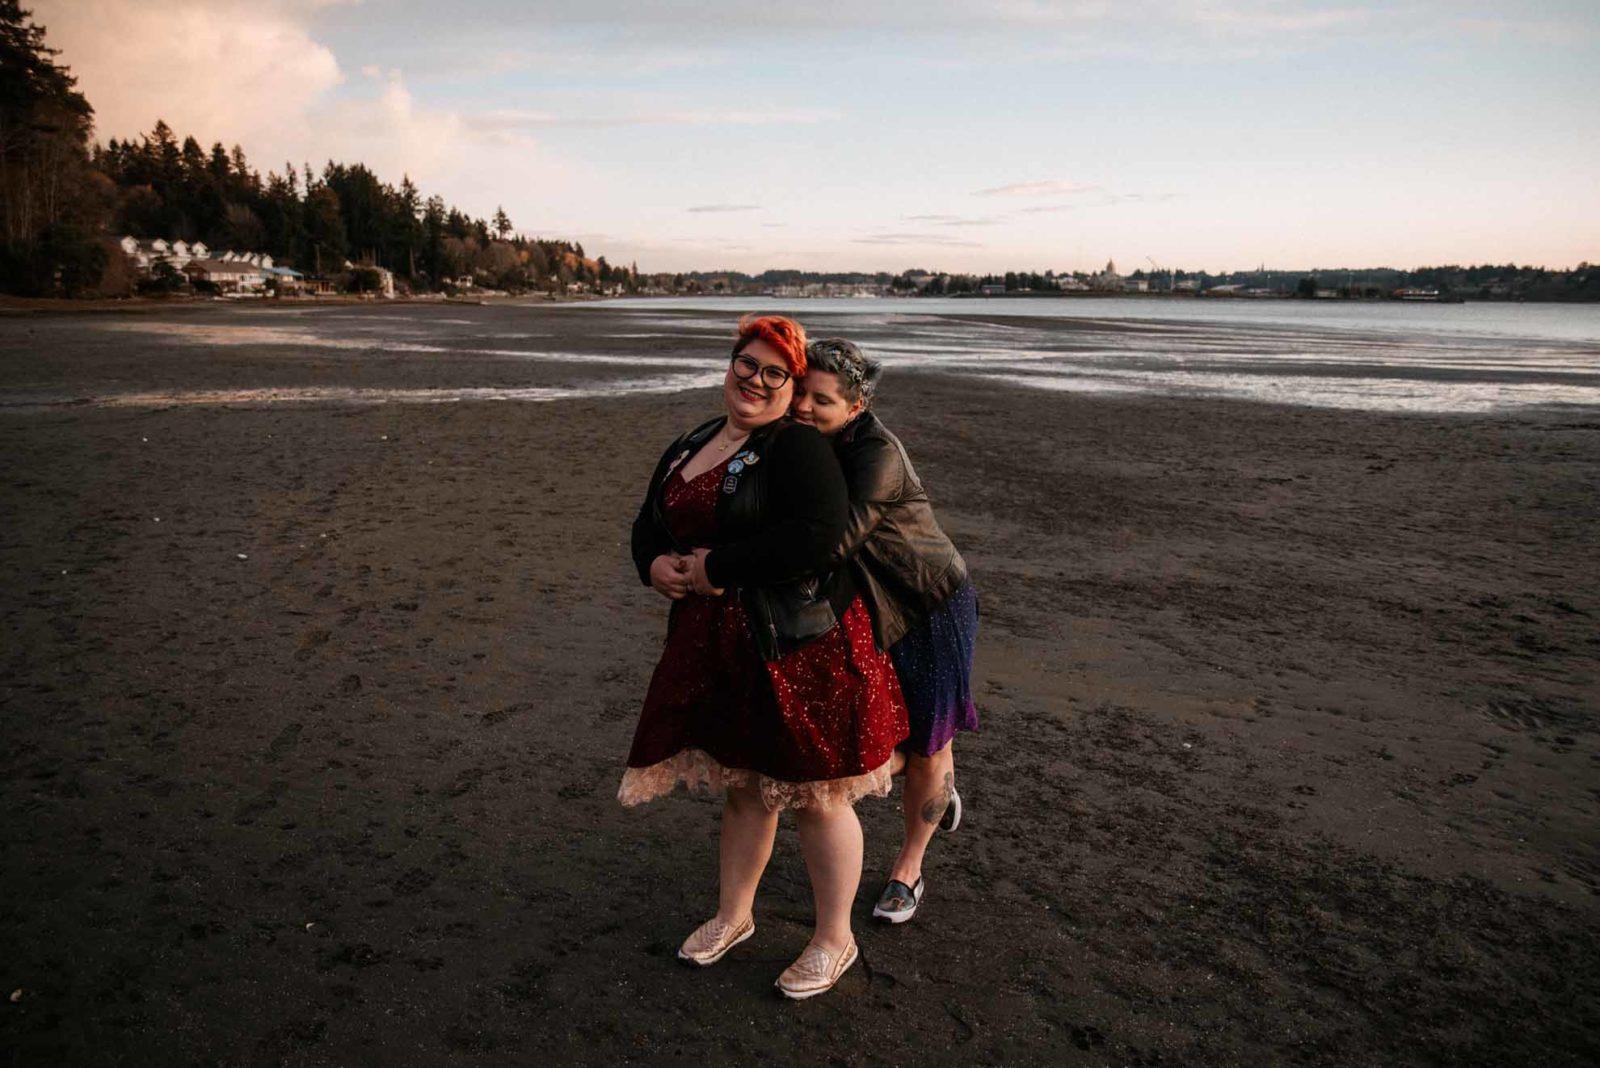 Emett Joseph photography lesbian gay lgbtq+ wedding elopement photography Seattle Washington Dancing With Her magazine